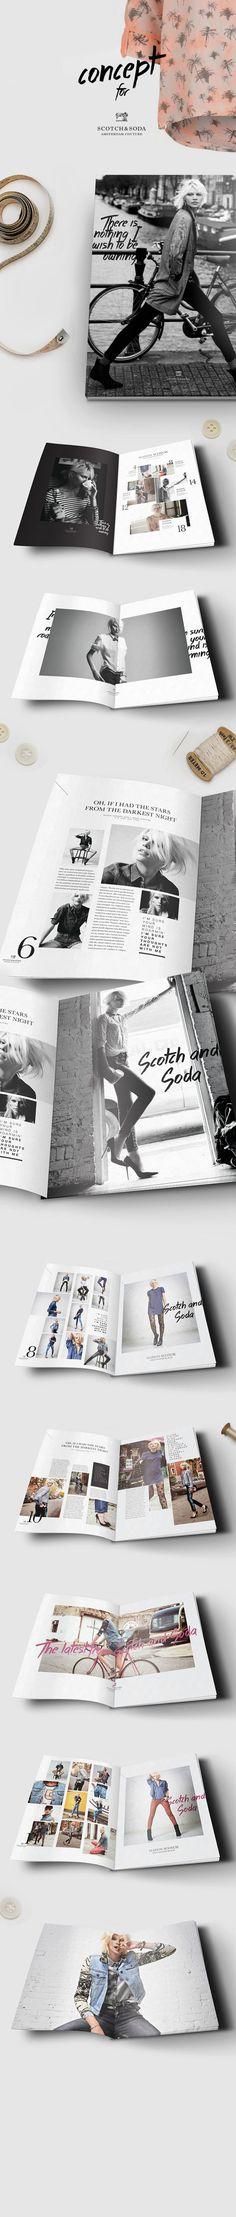 Scotch & Soda magazine/lookbook concept by jo van grinderbeek, via Behance